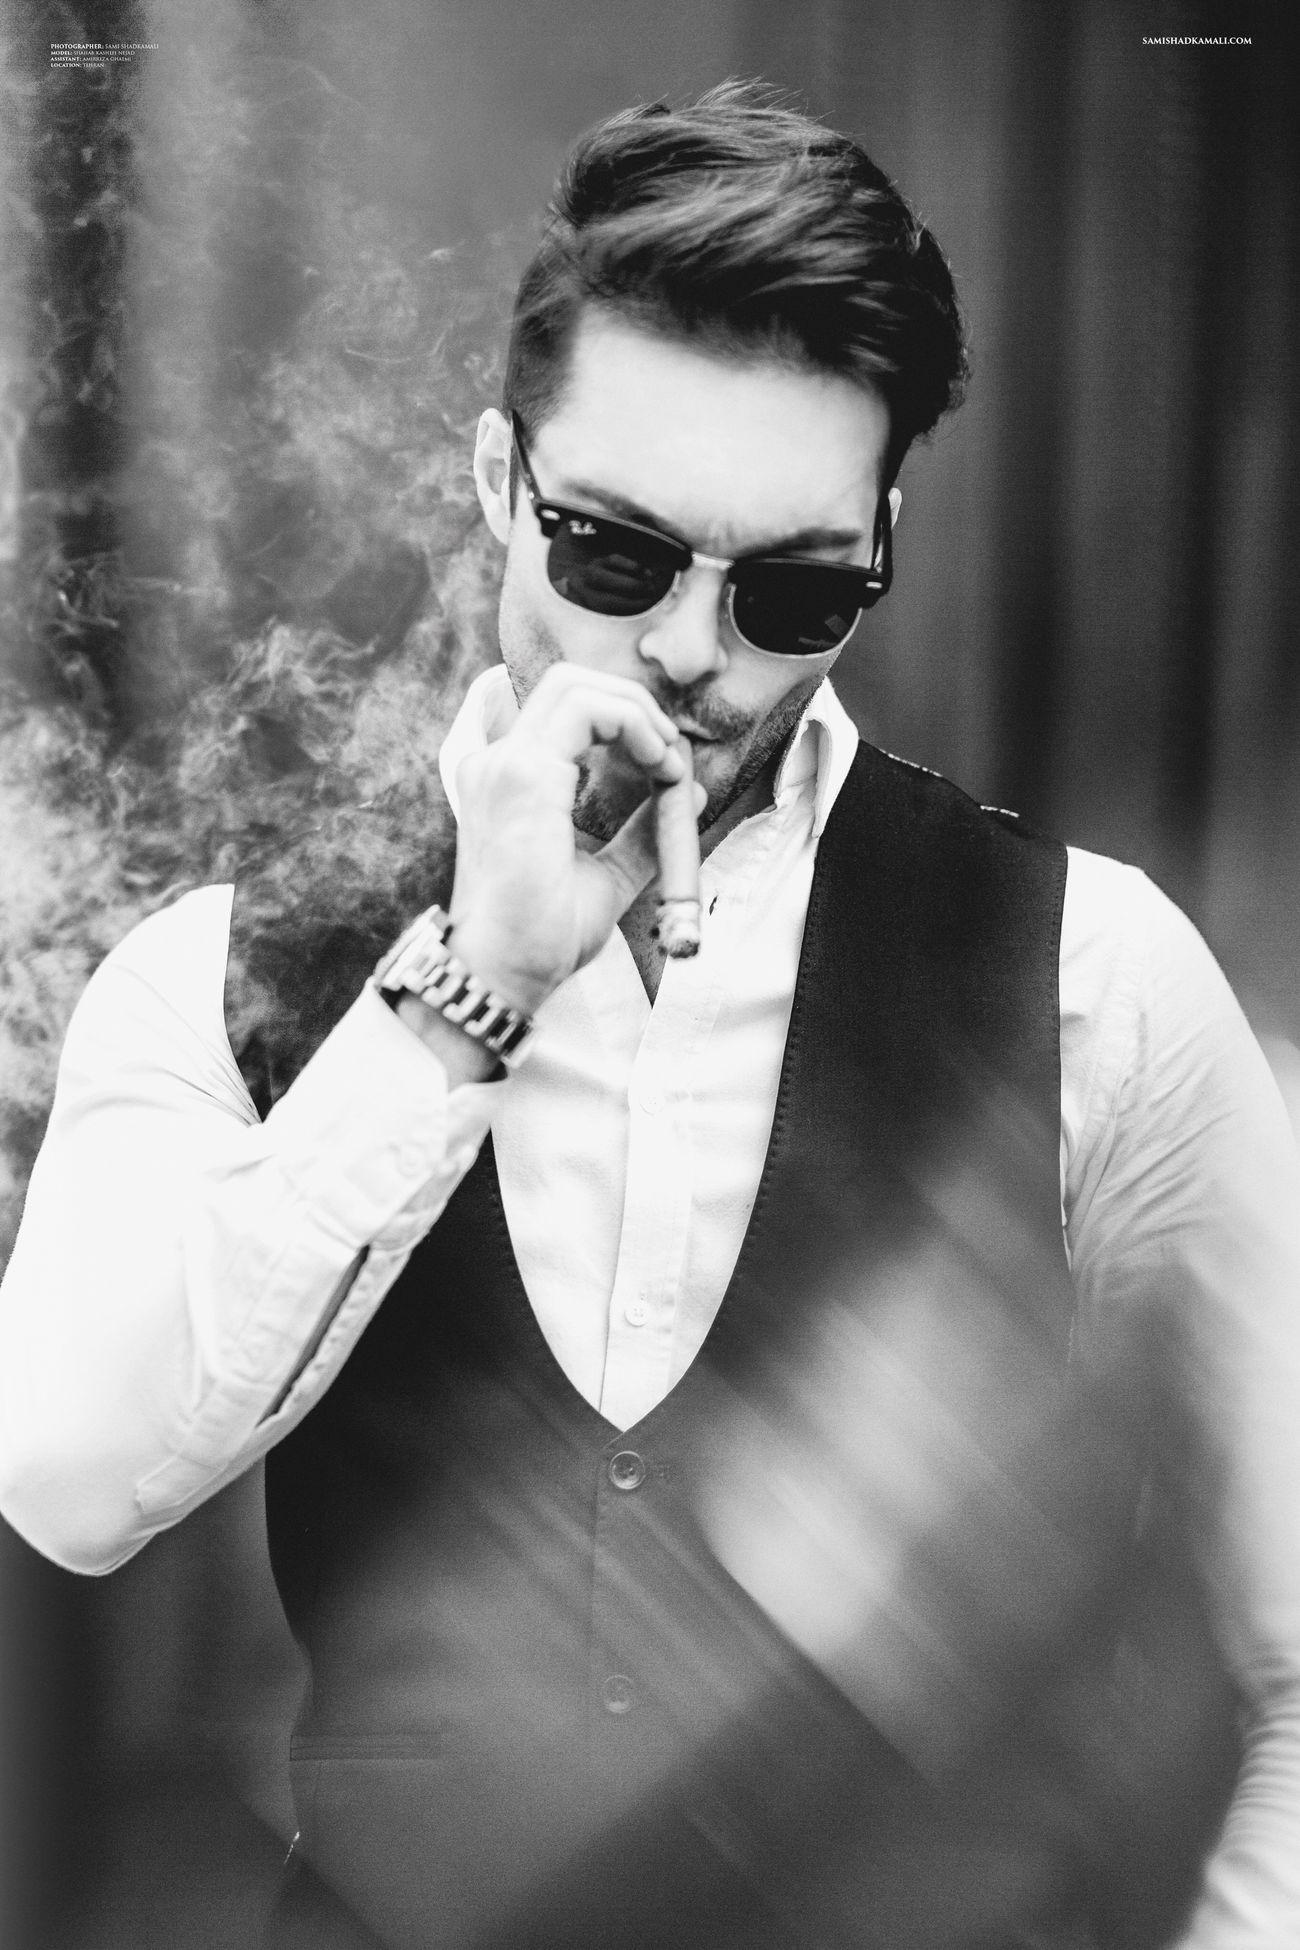 Modeling Male Malemodel  Model Black & White Fashion Photography Bow Tie Sunglasses One Person Reflection Shahabkashefi Iranian Persian Vogue GQ Style Fashion